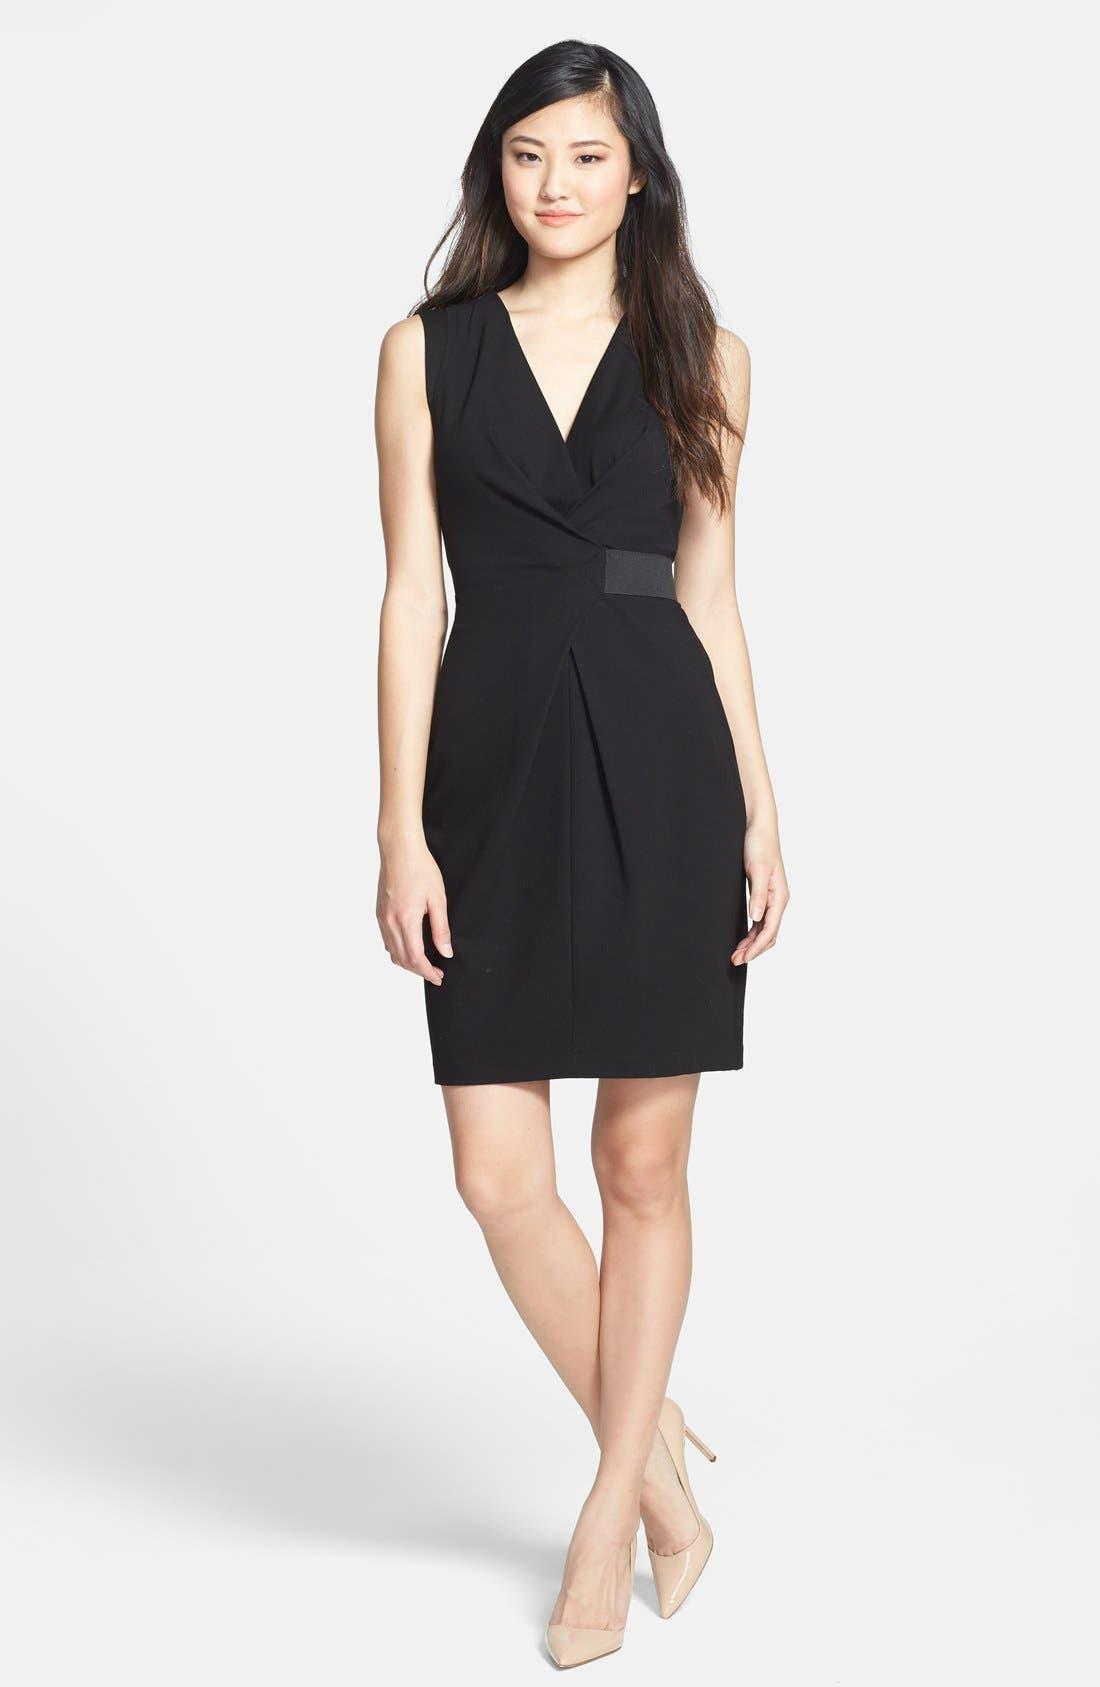 Alternate Image 1 Selected - Kenneth Cole New York 'Samantha' Dress